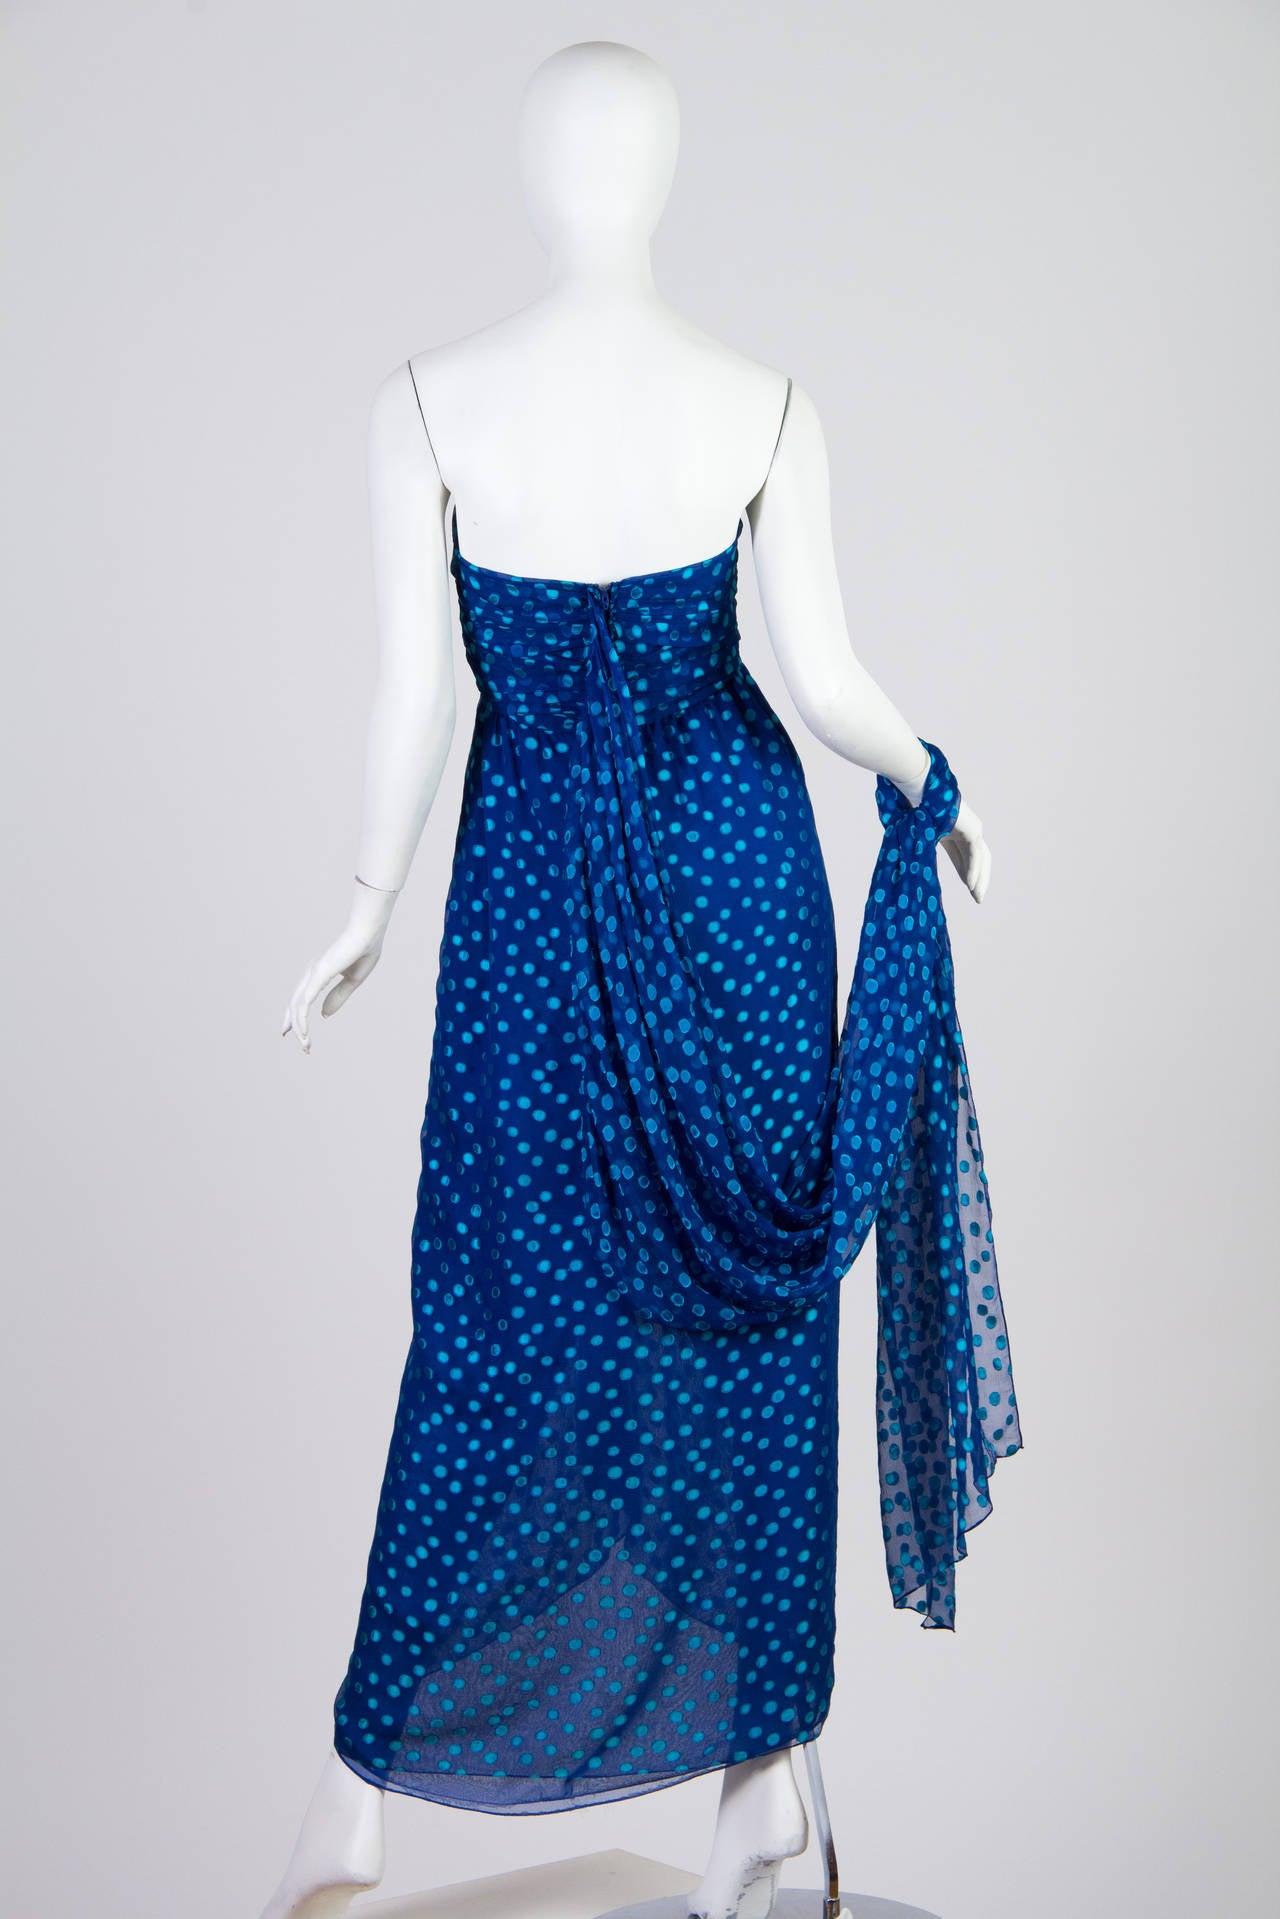 1970s Oscar de la Renta Chiffon Dress For Sale 2